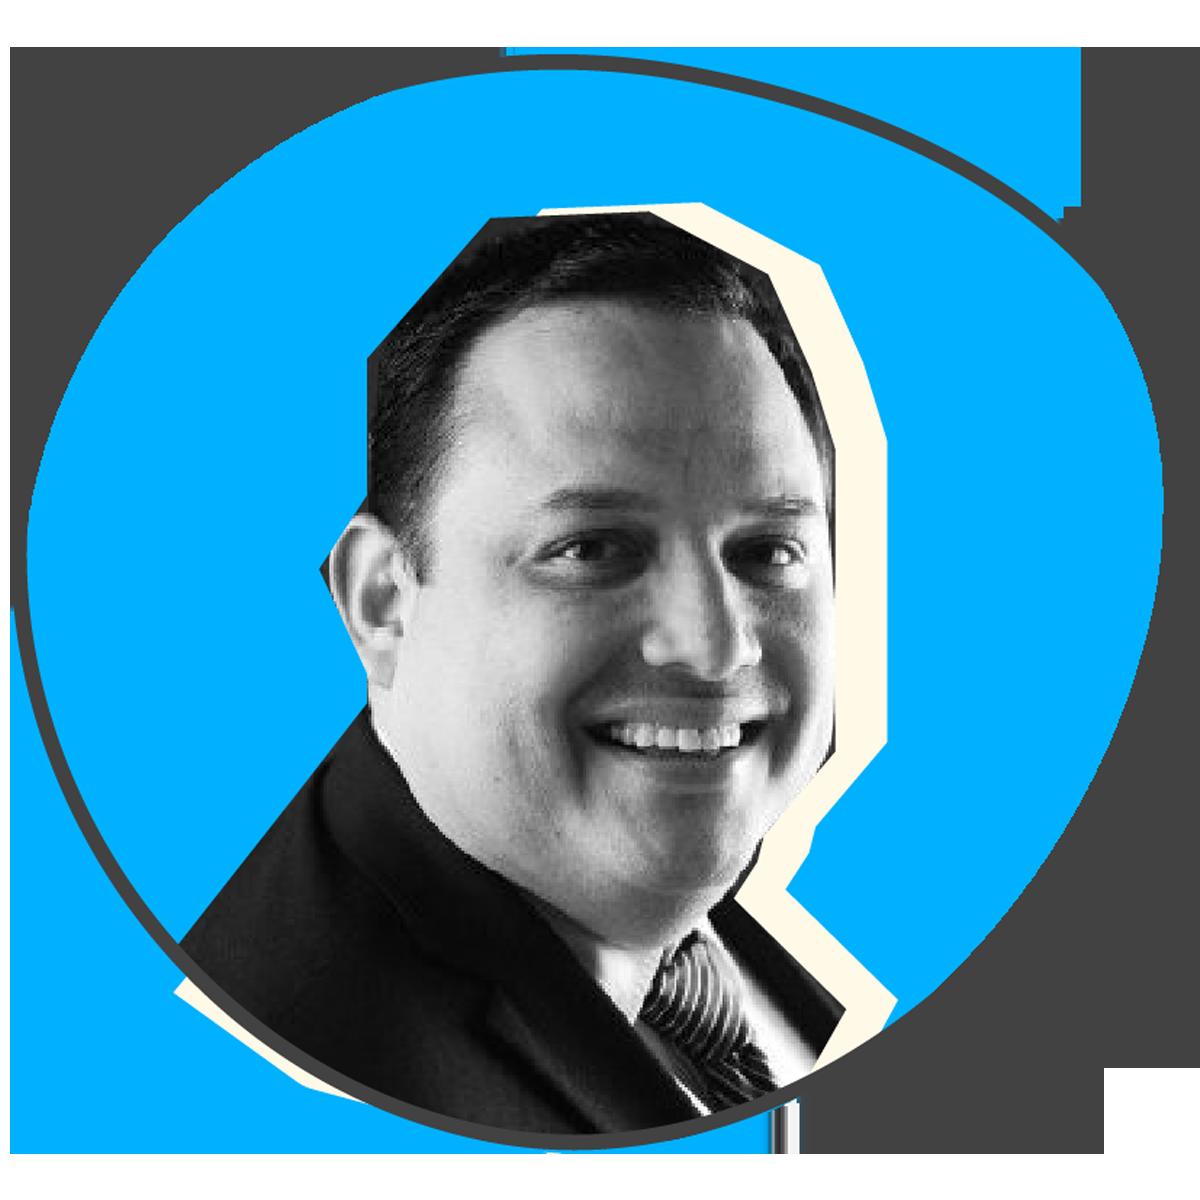 Carlos Blé, apithy CEO & Co-founder